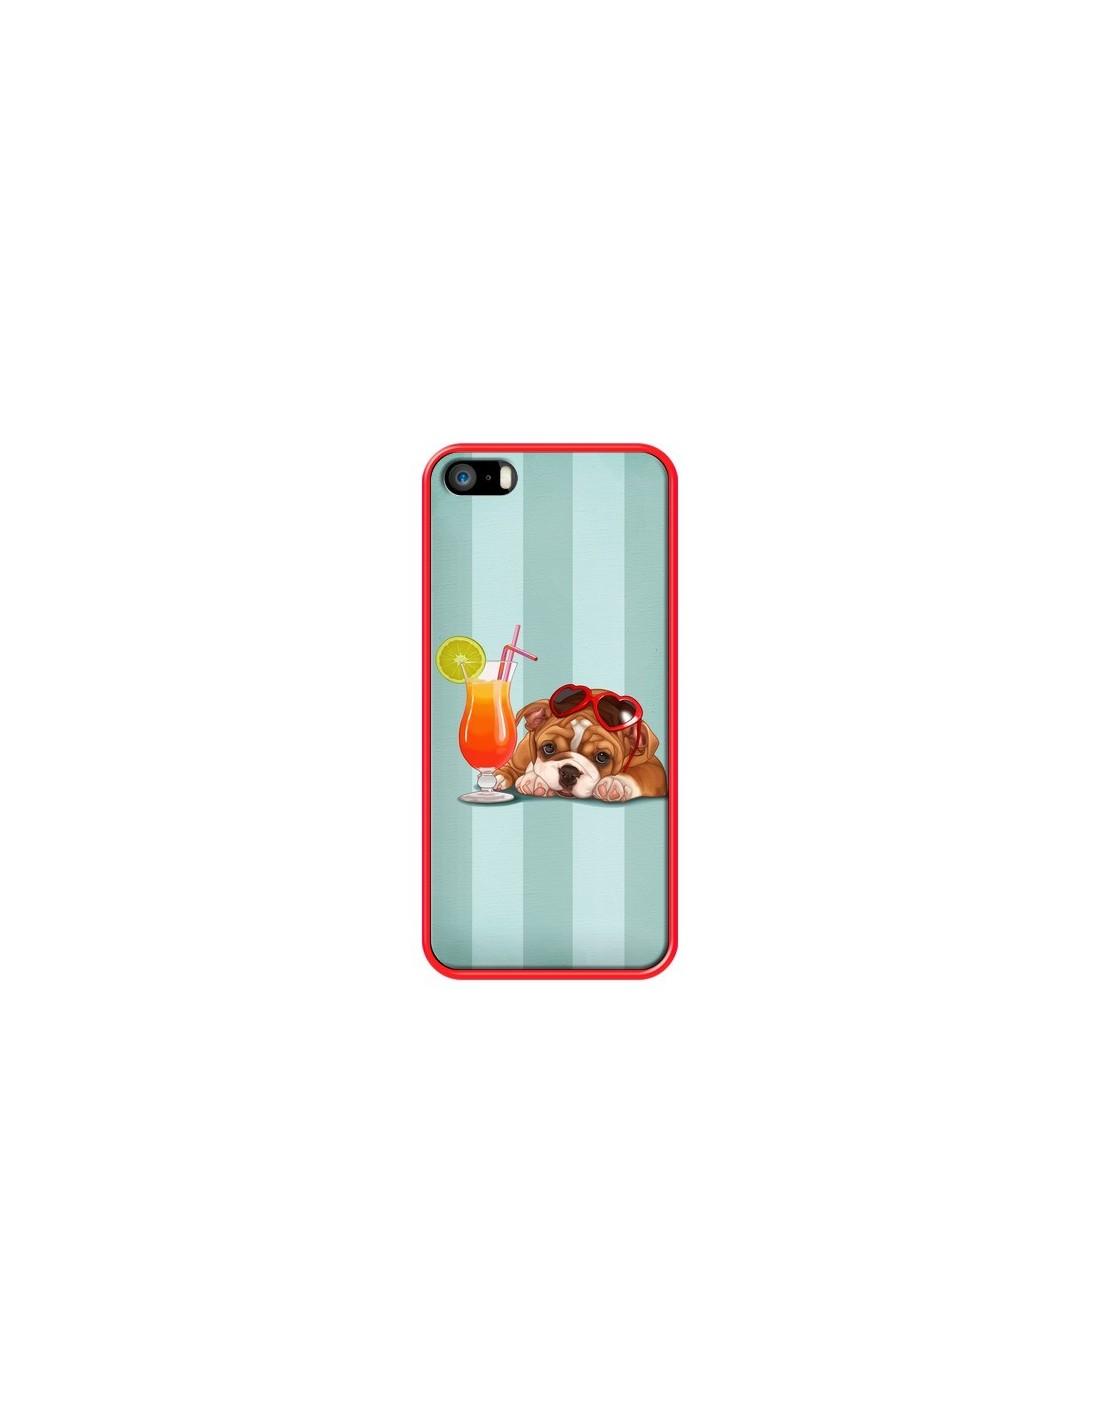 Coque Iphone S Chien